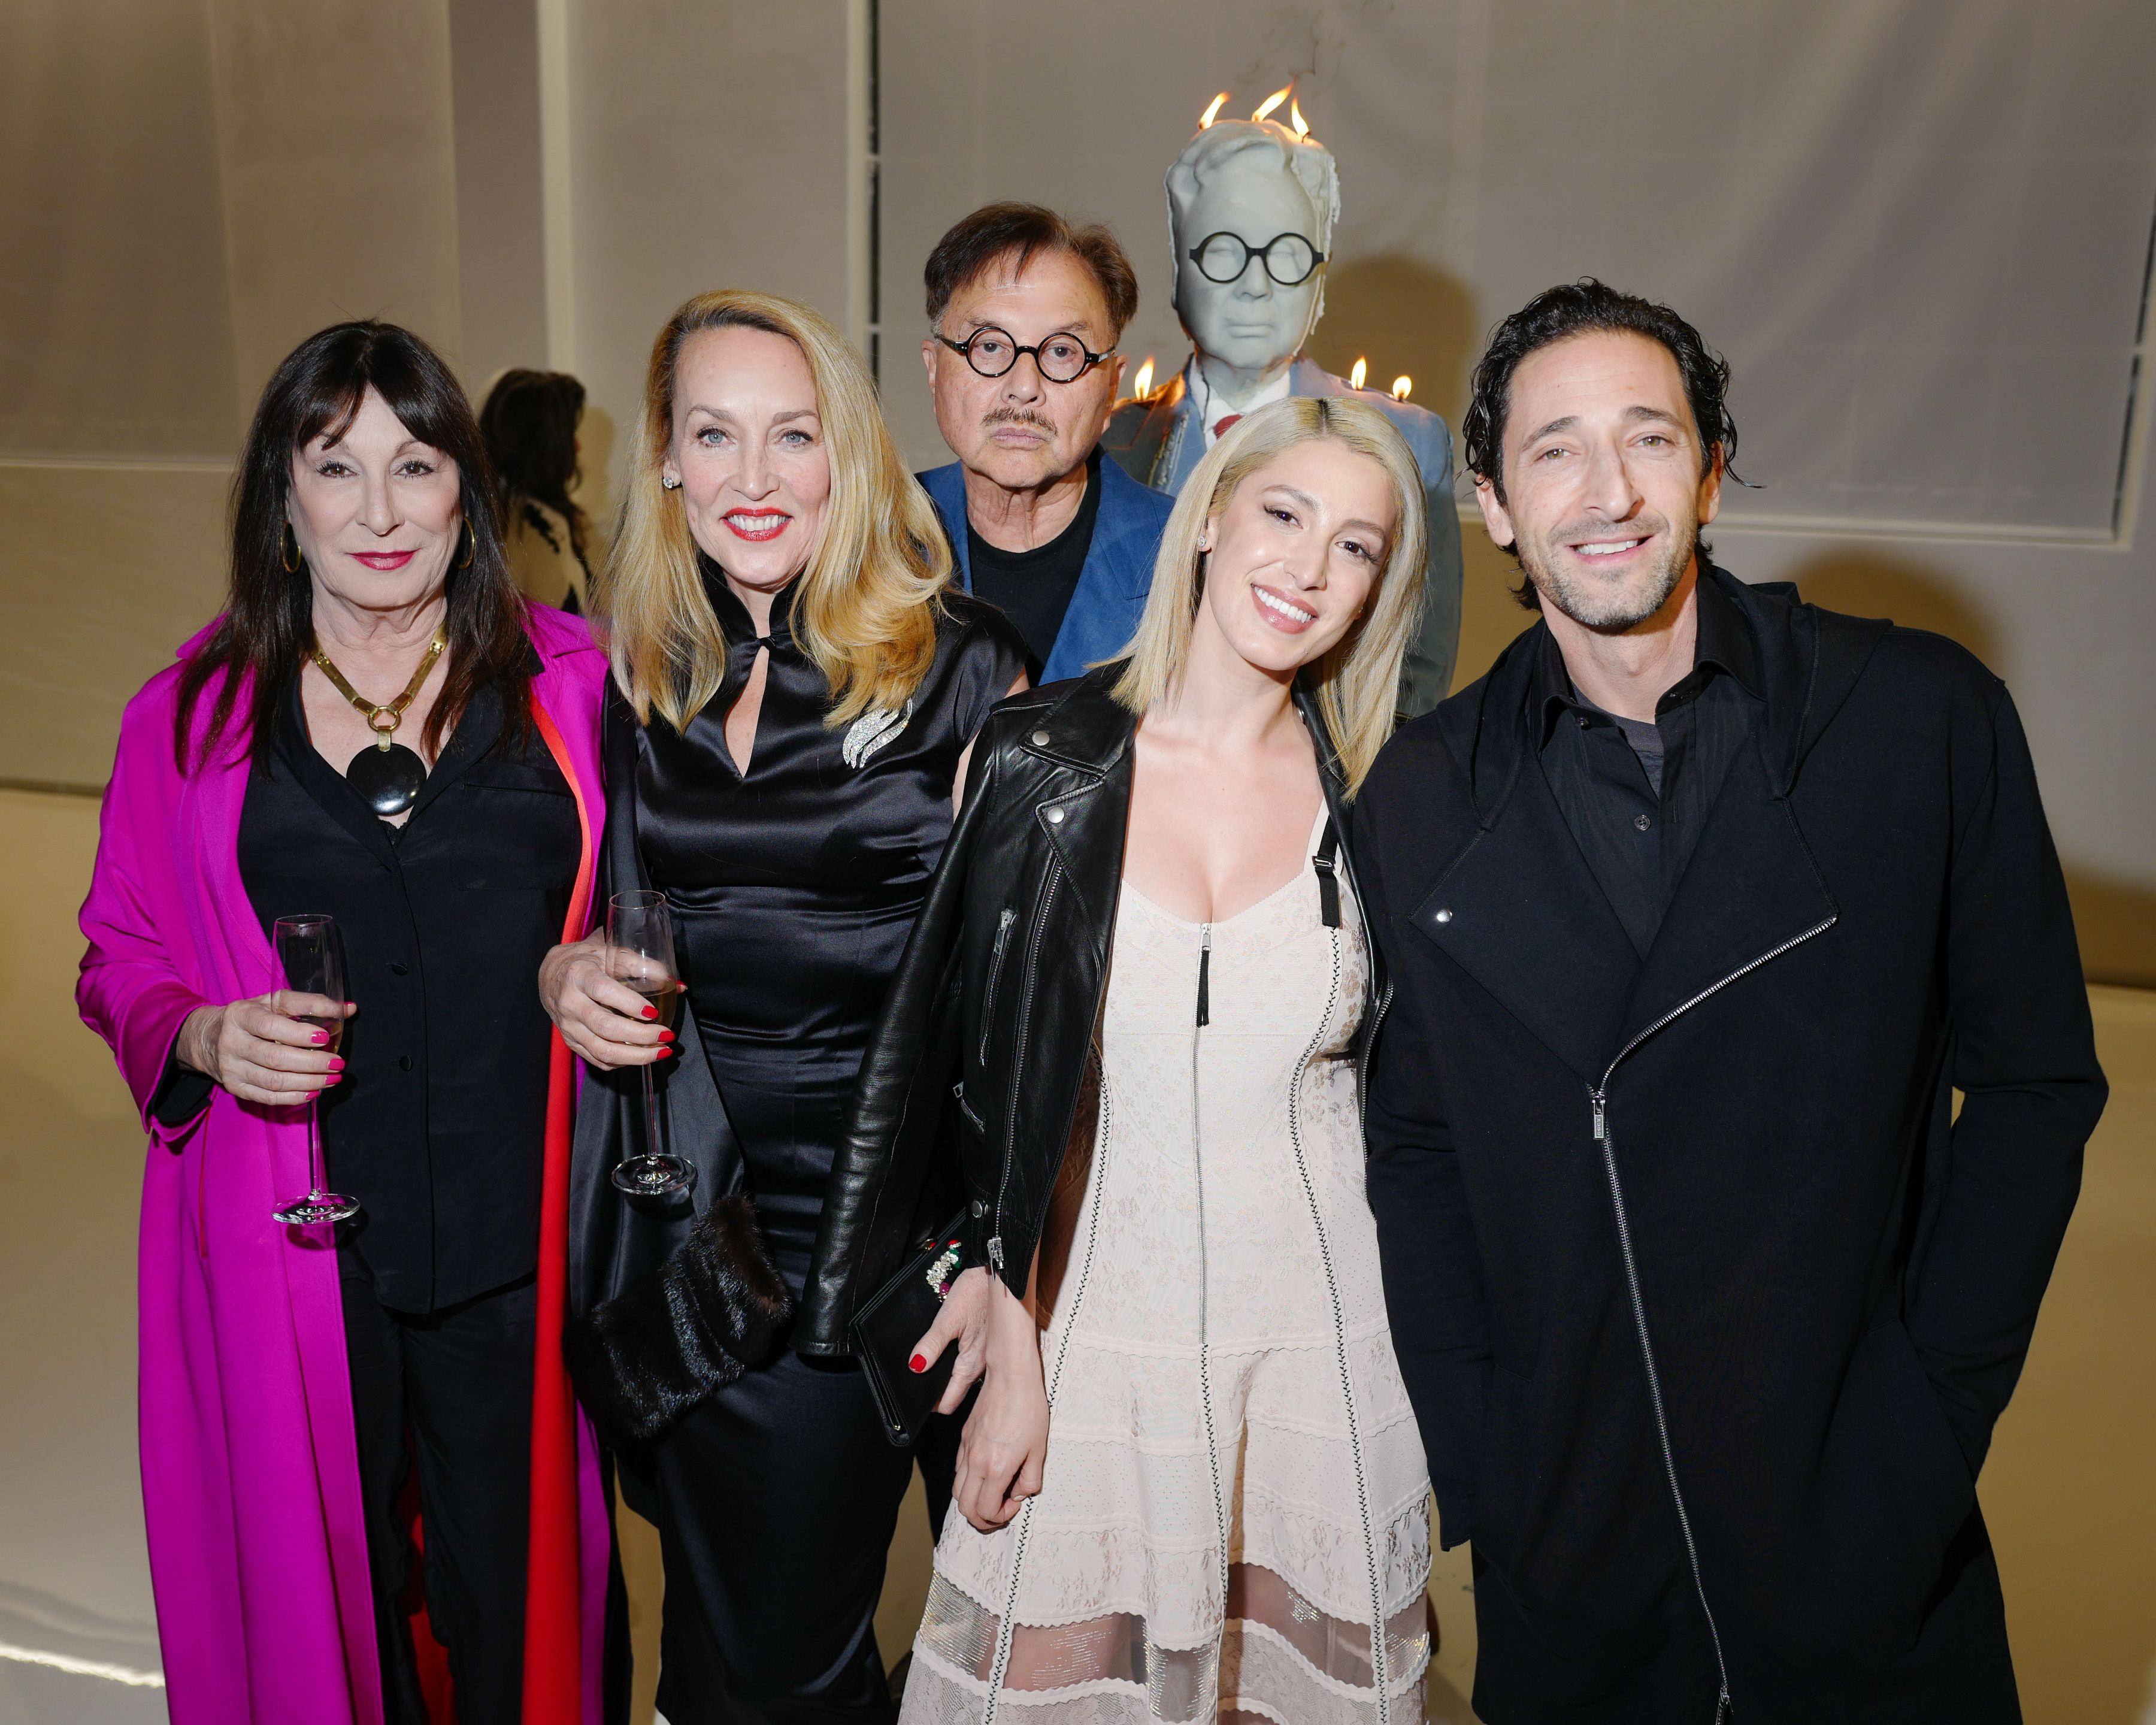 Anjelica Huston, Jerry Hall, Michael Chow, Vanessa Rano, Adrien BrodyMr Chow 50th Anniversary celebration, Inside, Los Angeles, USA - 16 Feb 2018